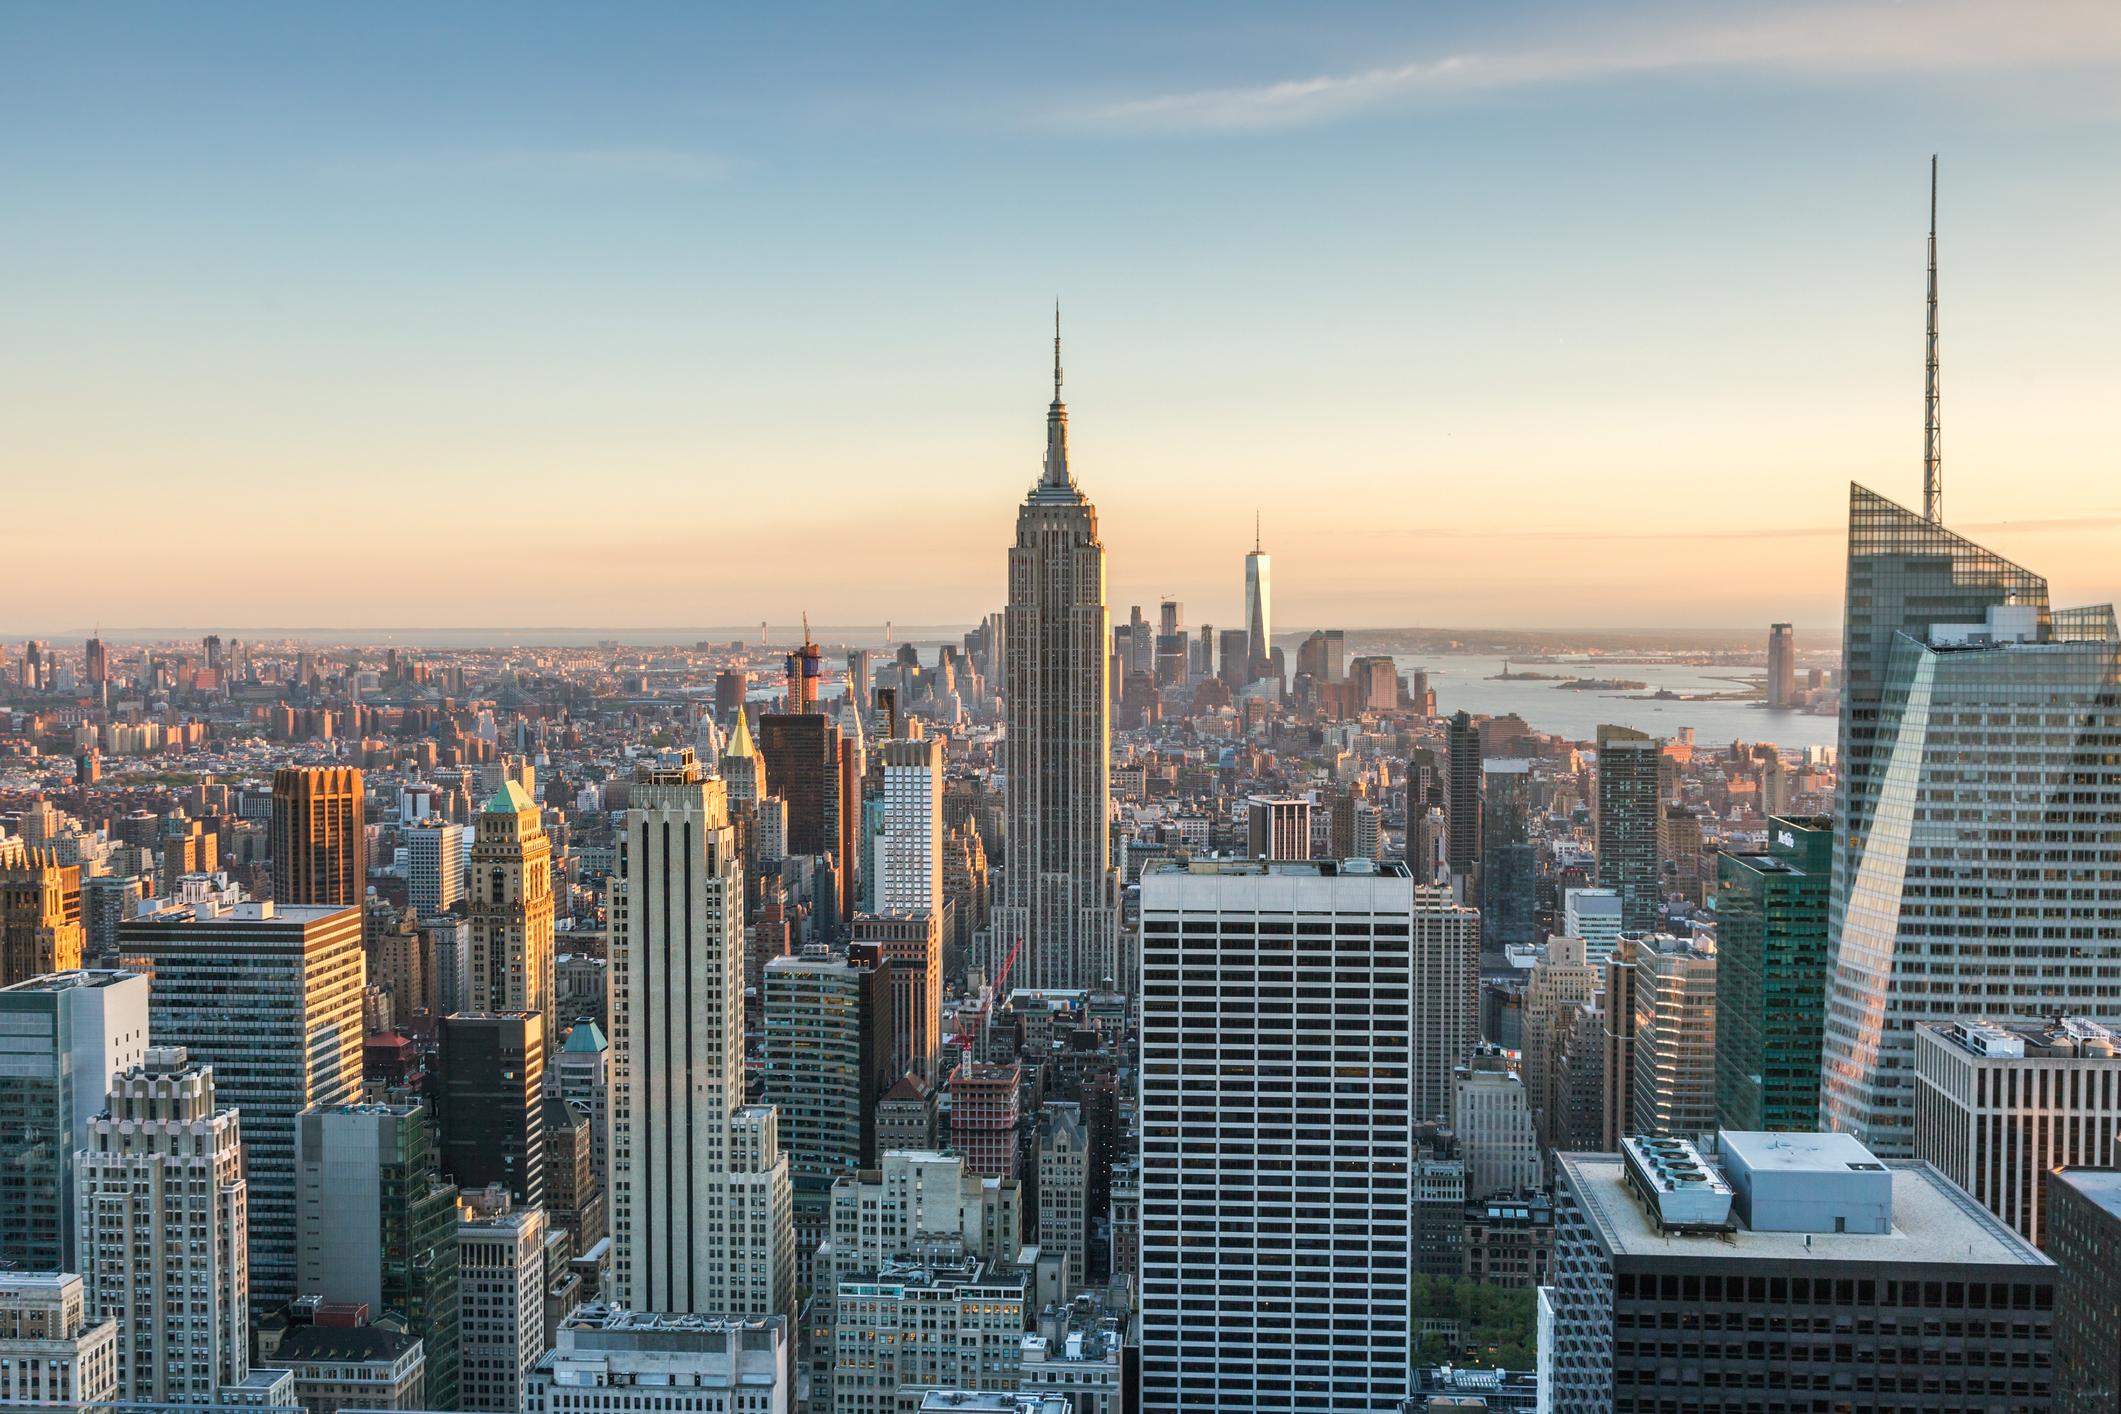 3 Cannabis Stocks That Can Cash In on New York's Legal Pot Market David Jagielski | Apr 14, 2021